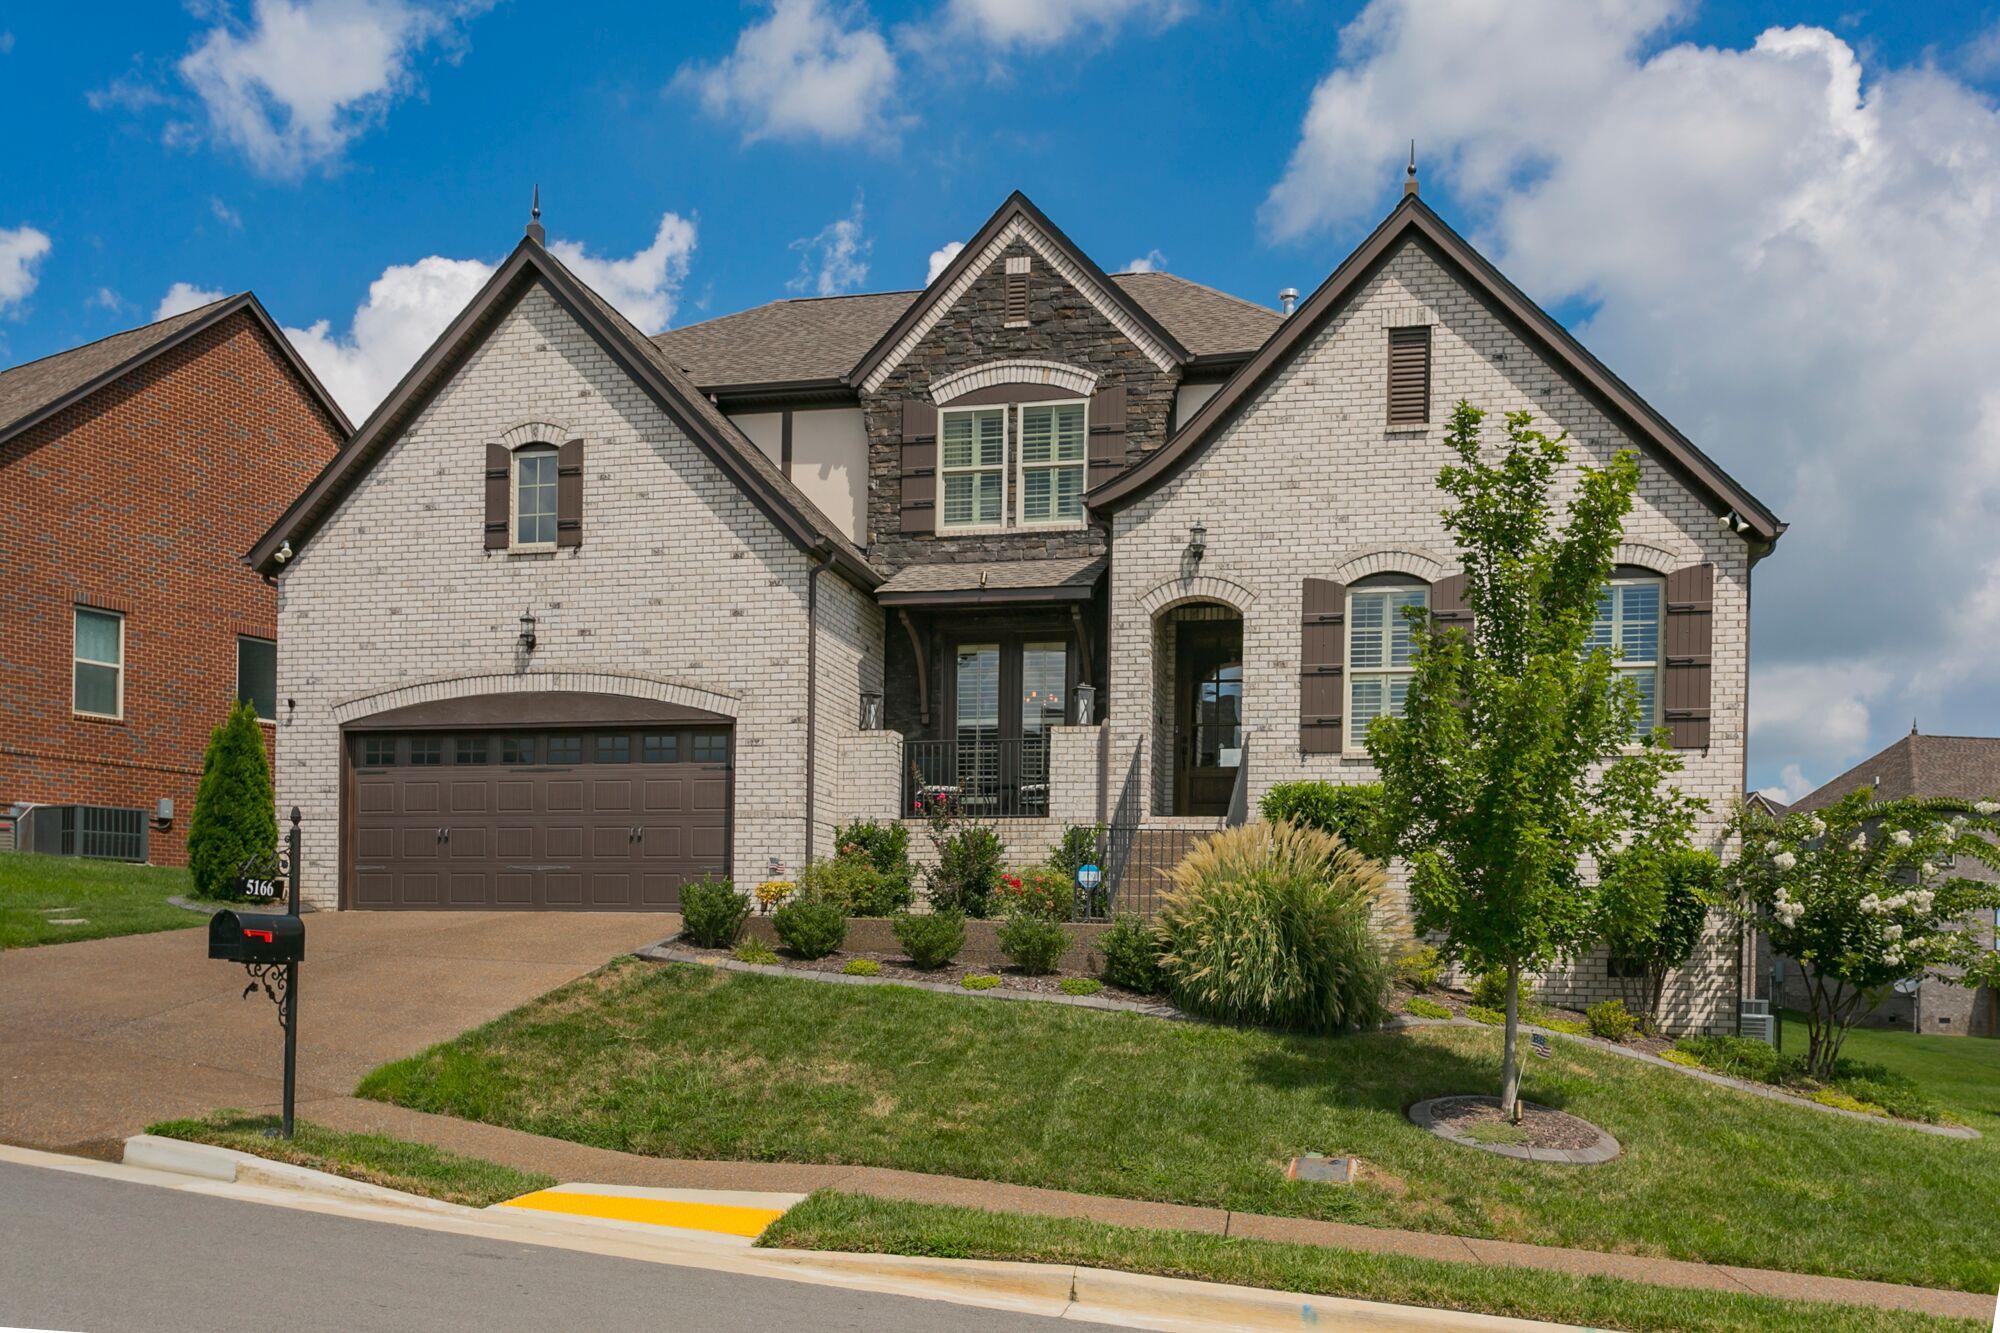 5166 Mountainbrook Cir, Hermitage, TN 37076 - Hermitage, TN real estate listing